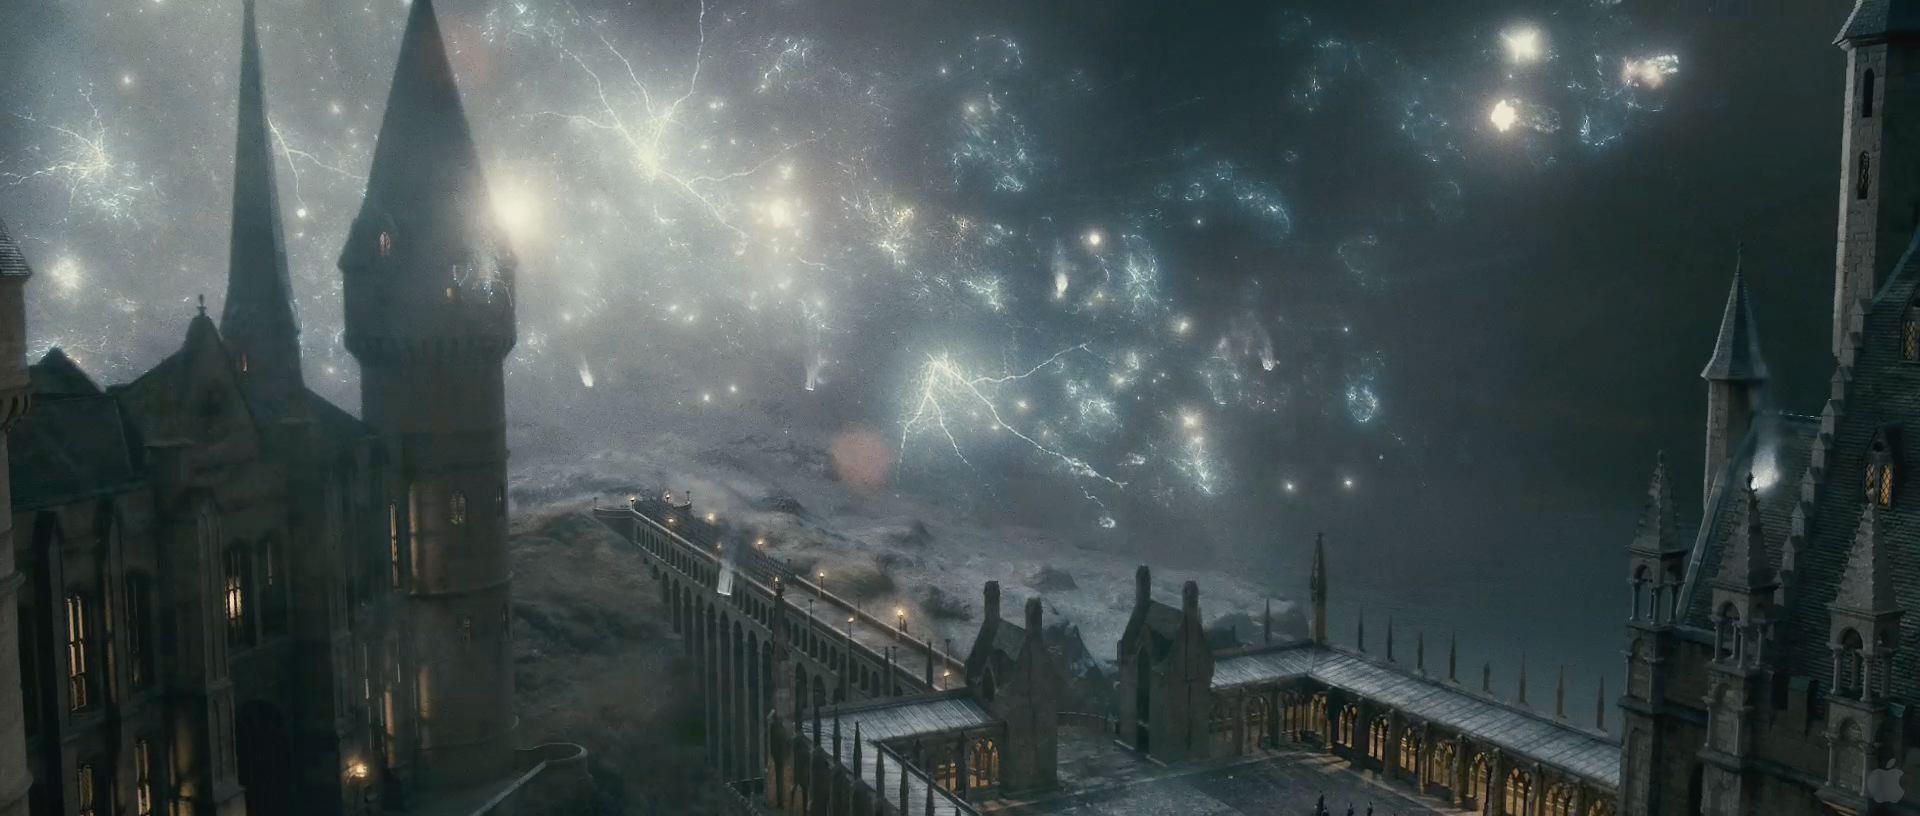 Harry Potter BlogHogwarts HP7 2 Trailer 40